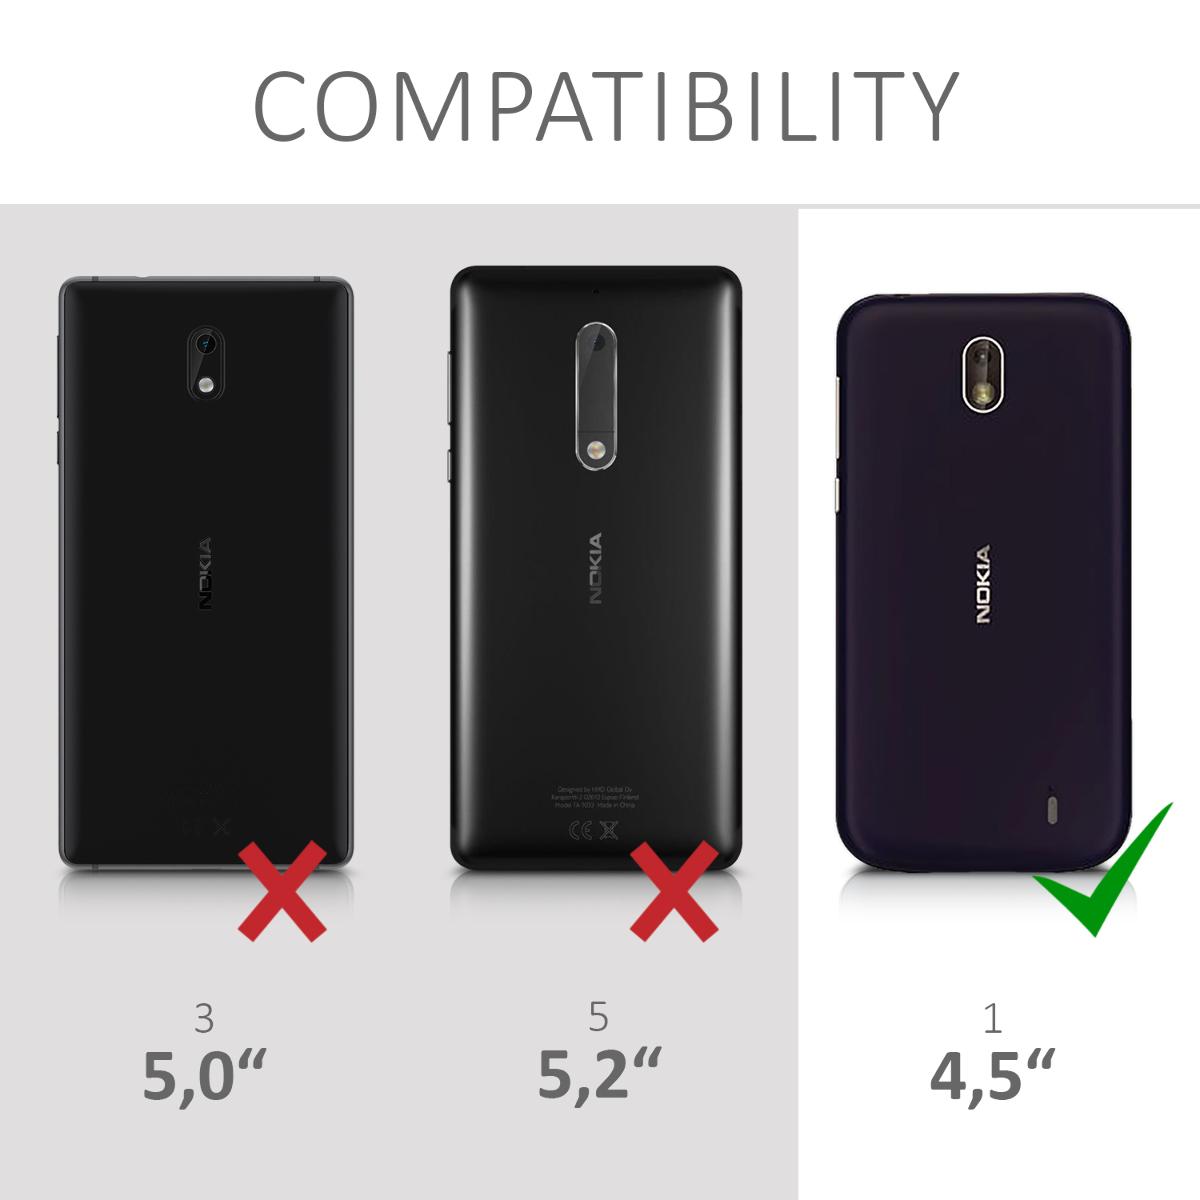 Luxusní flipové pouzdro KWmobile Canvas Wallet na mobil Nokia 1 šedé ... 0c38771af8e